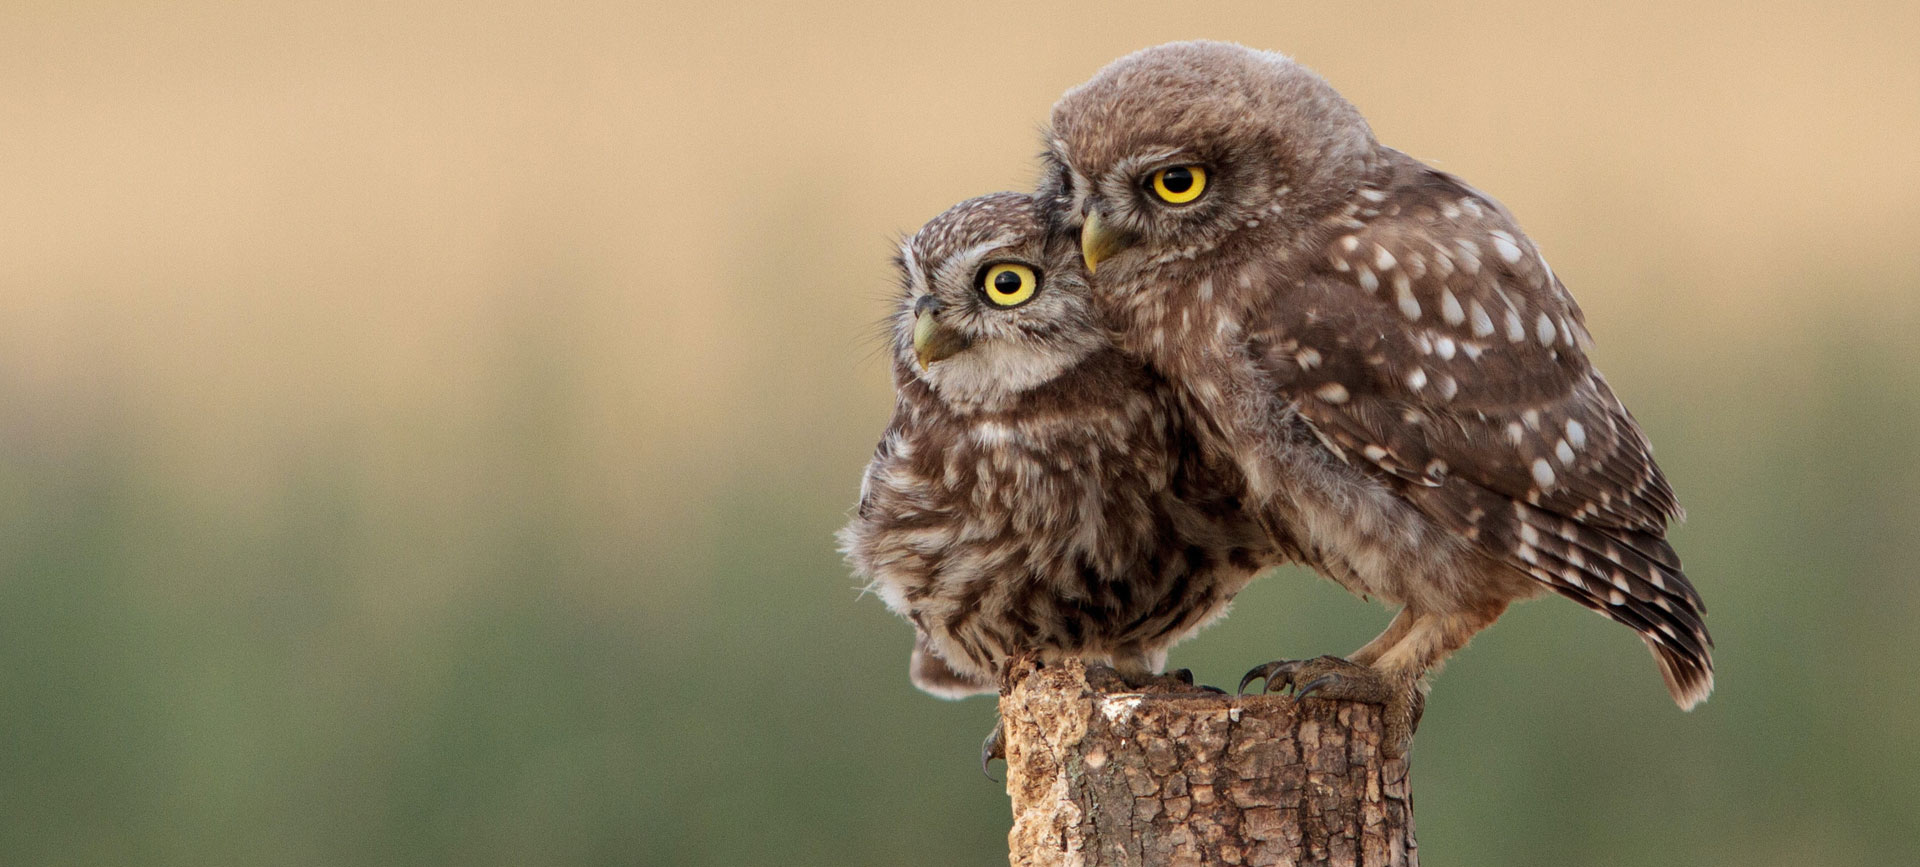 Wat is Birdnesting?